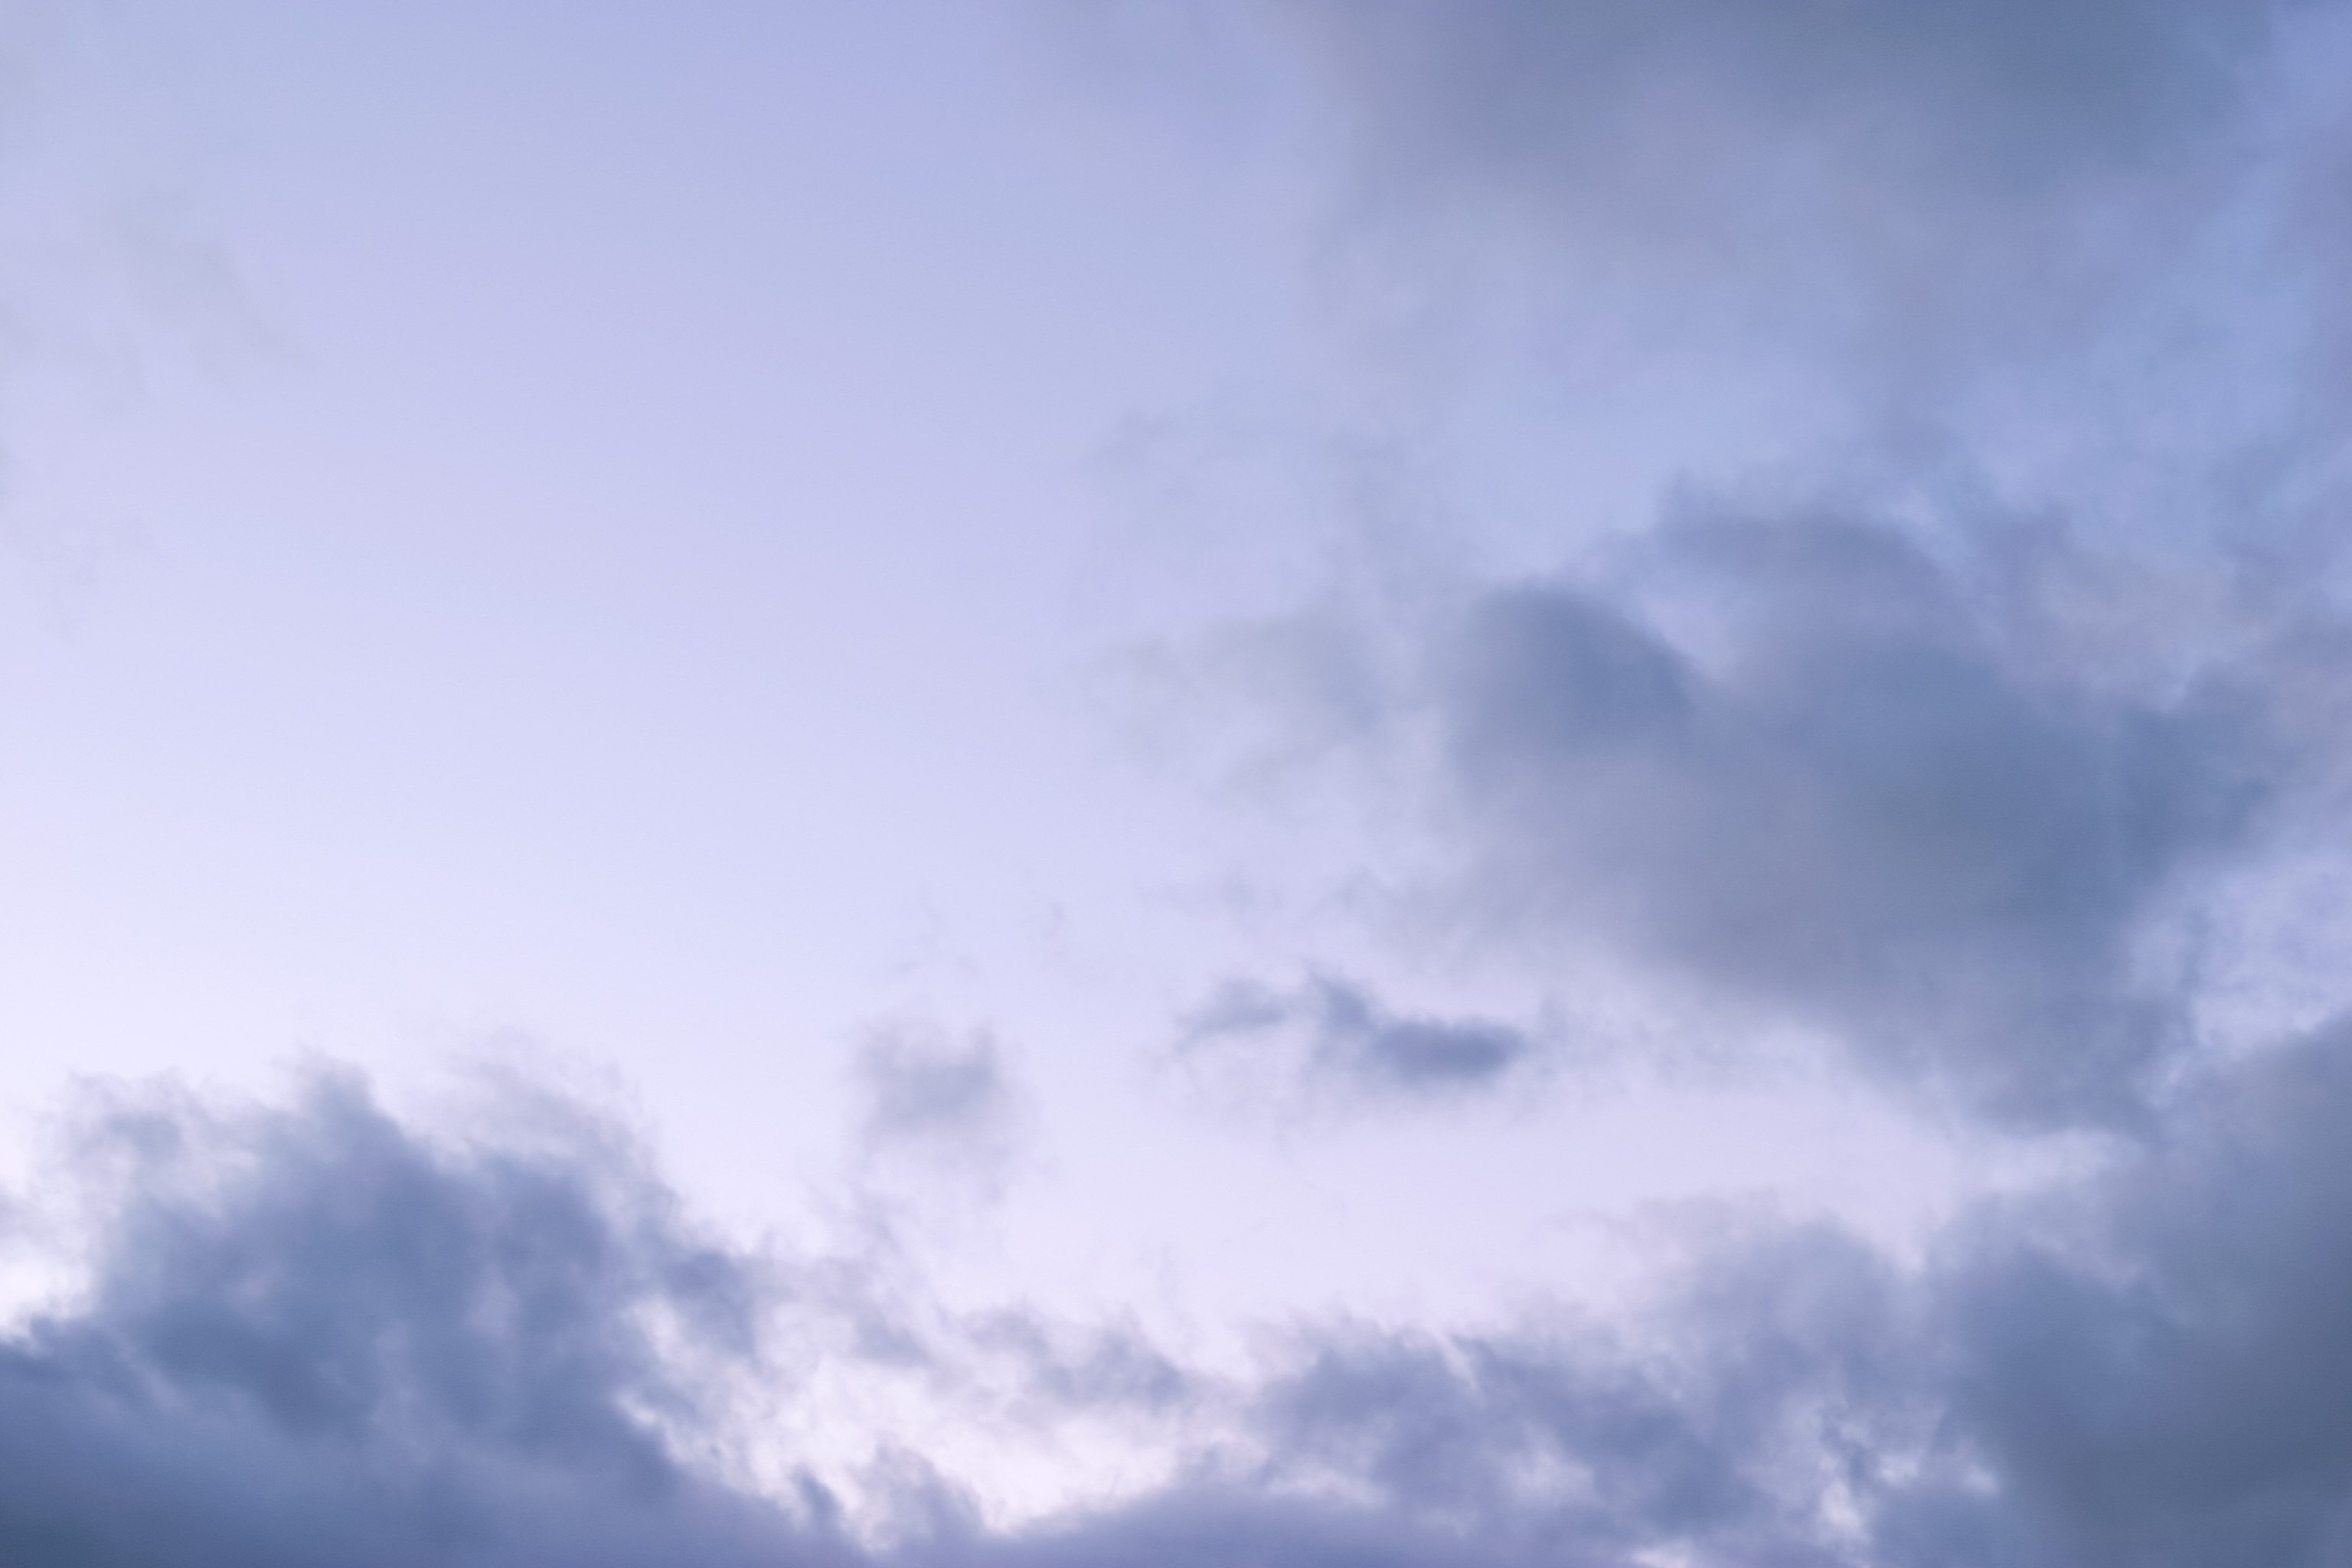 紫色の風景 Free Photos L/RGB/JPEG/350dpi